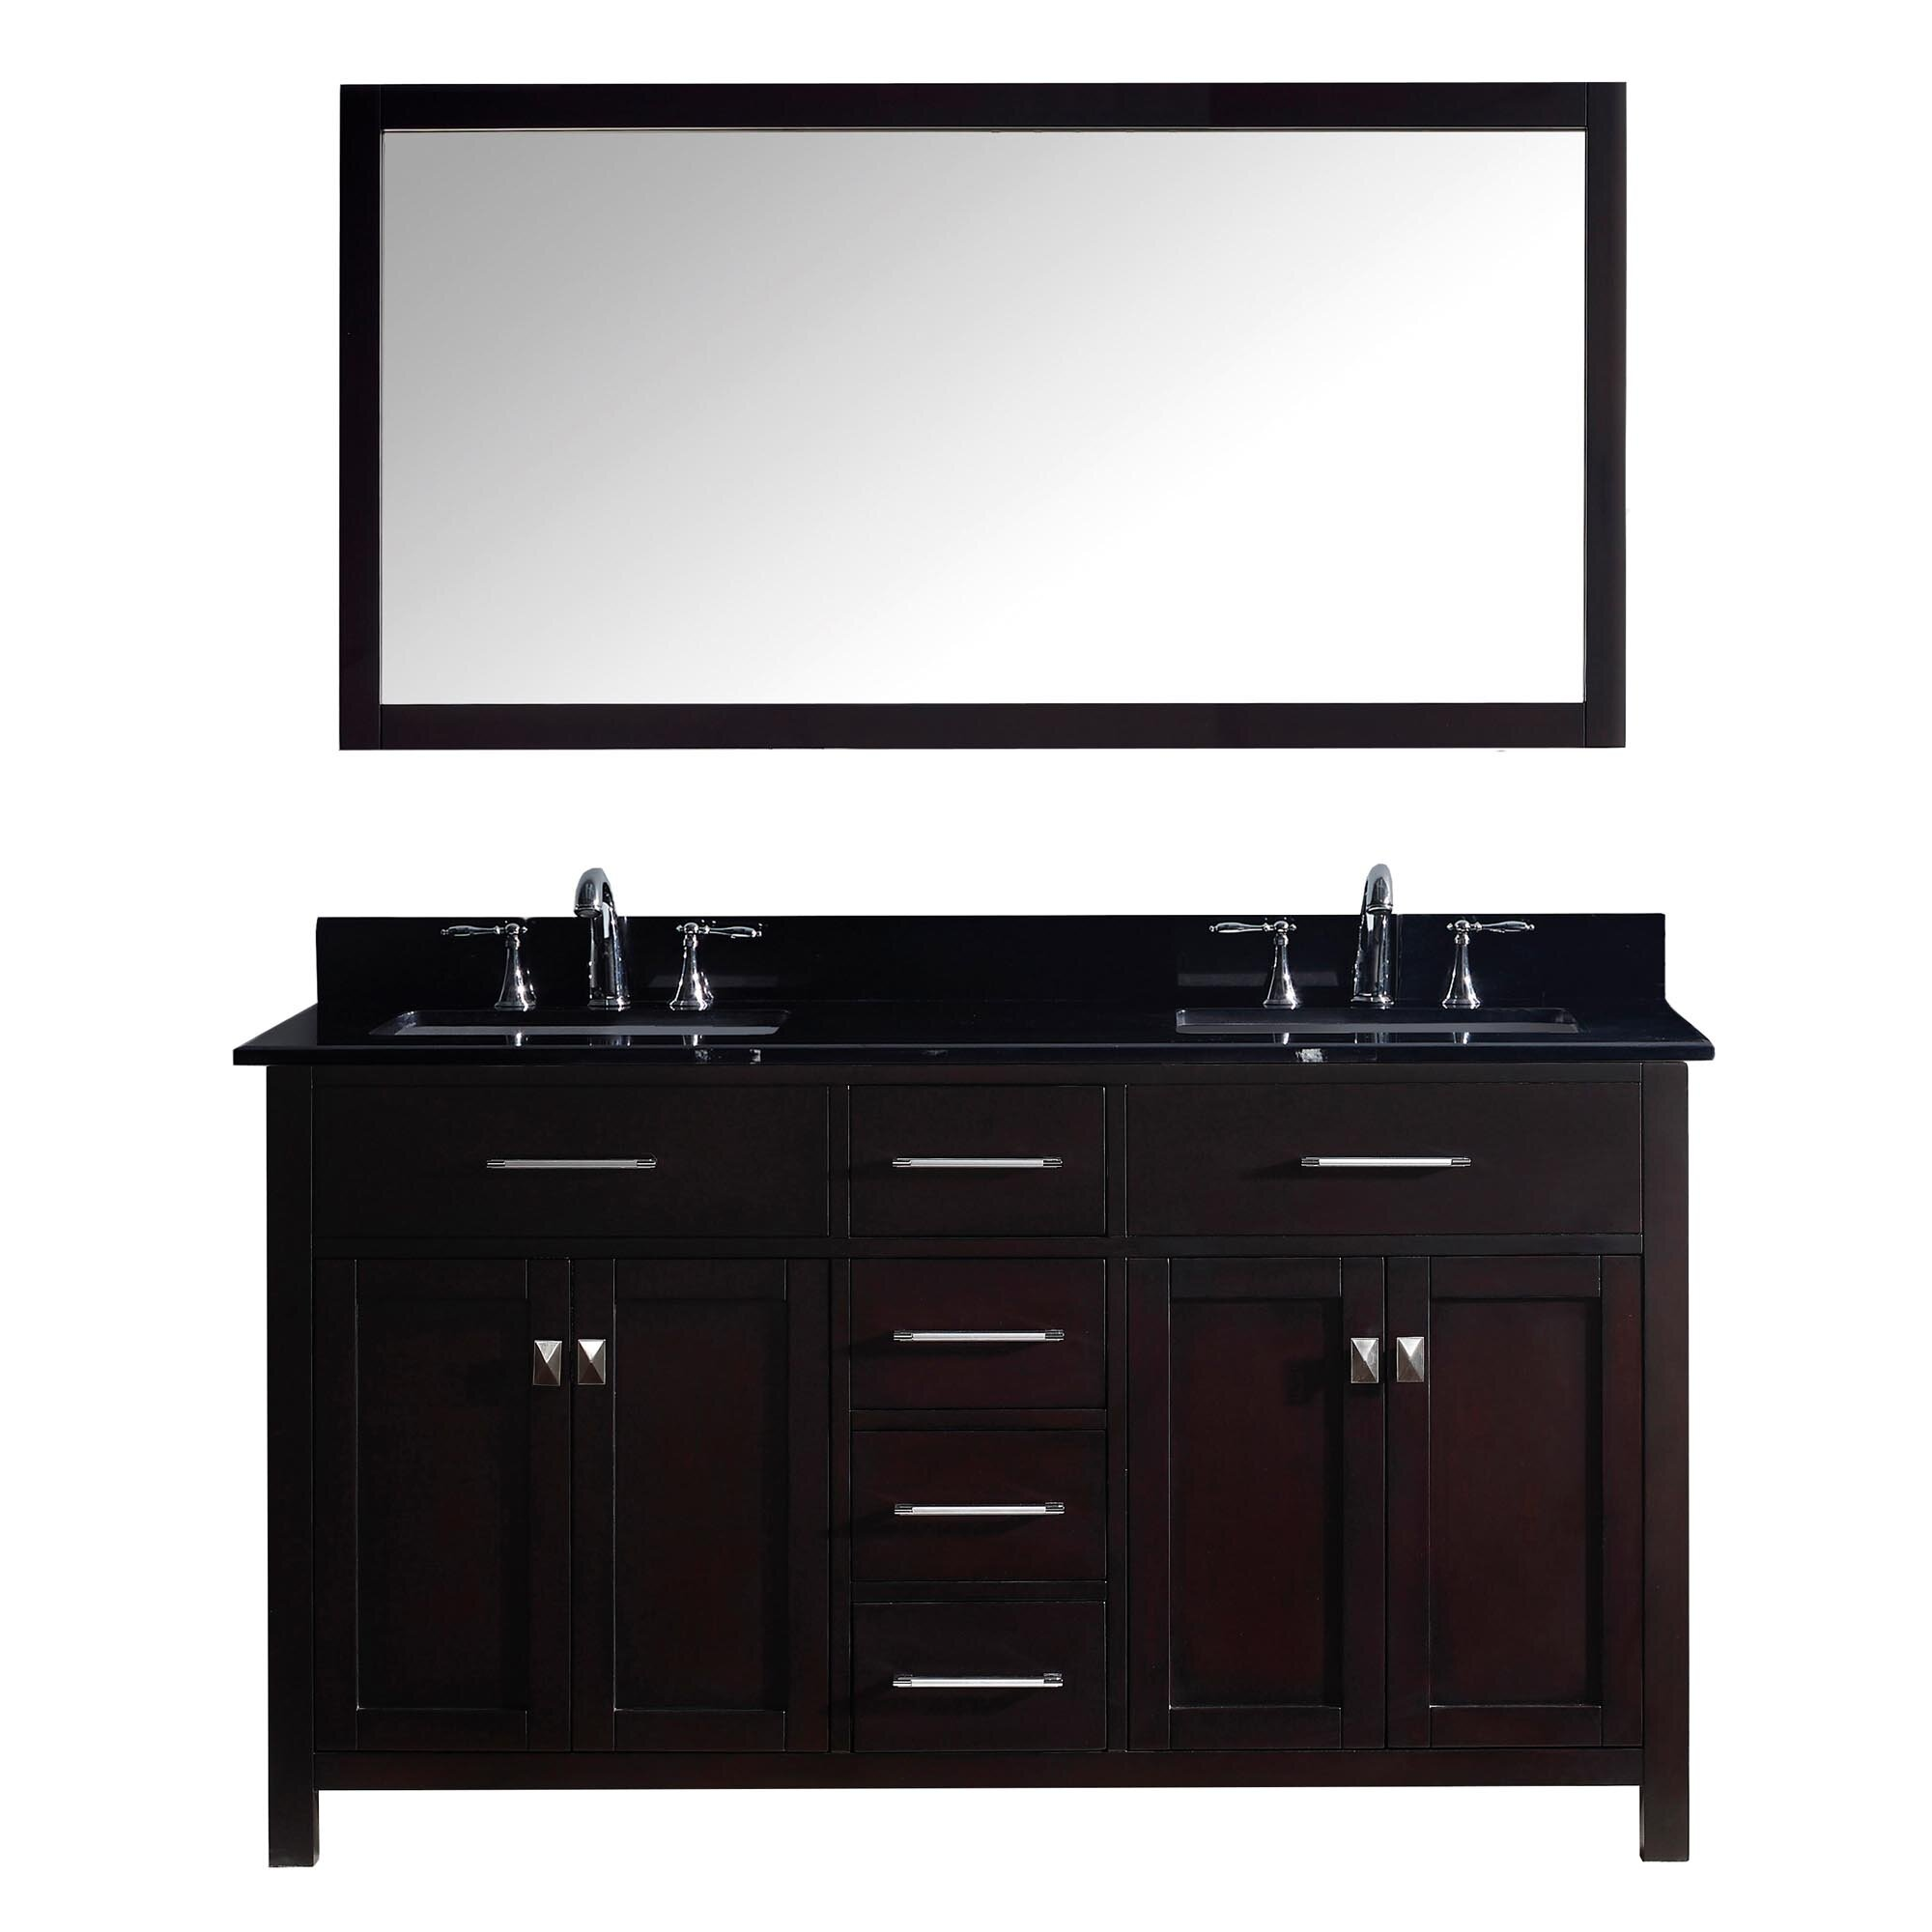 Virtu caroline 60 double bathroom vanity set with black for Bathroom mirror set